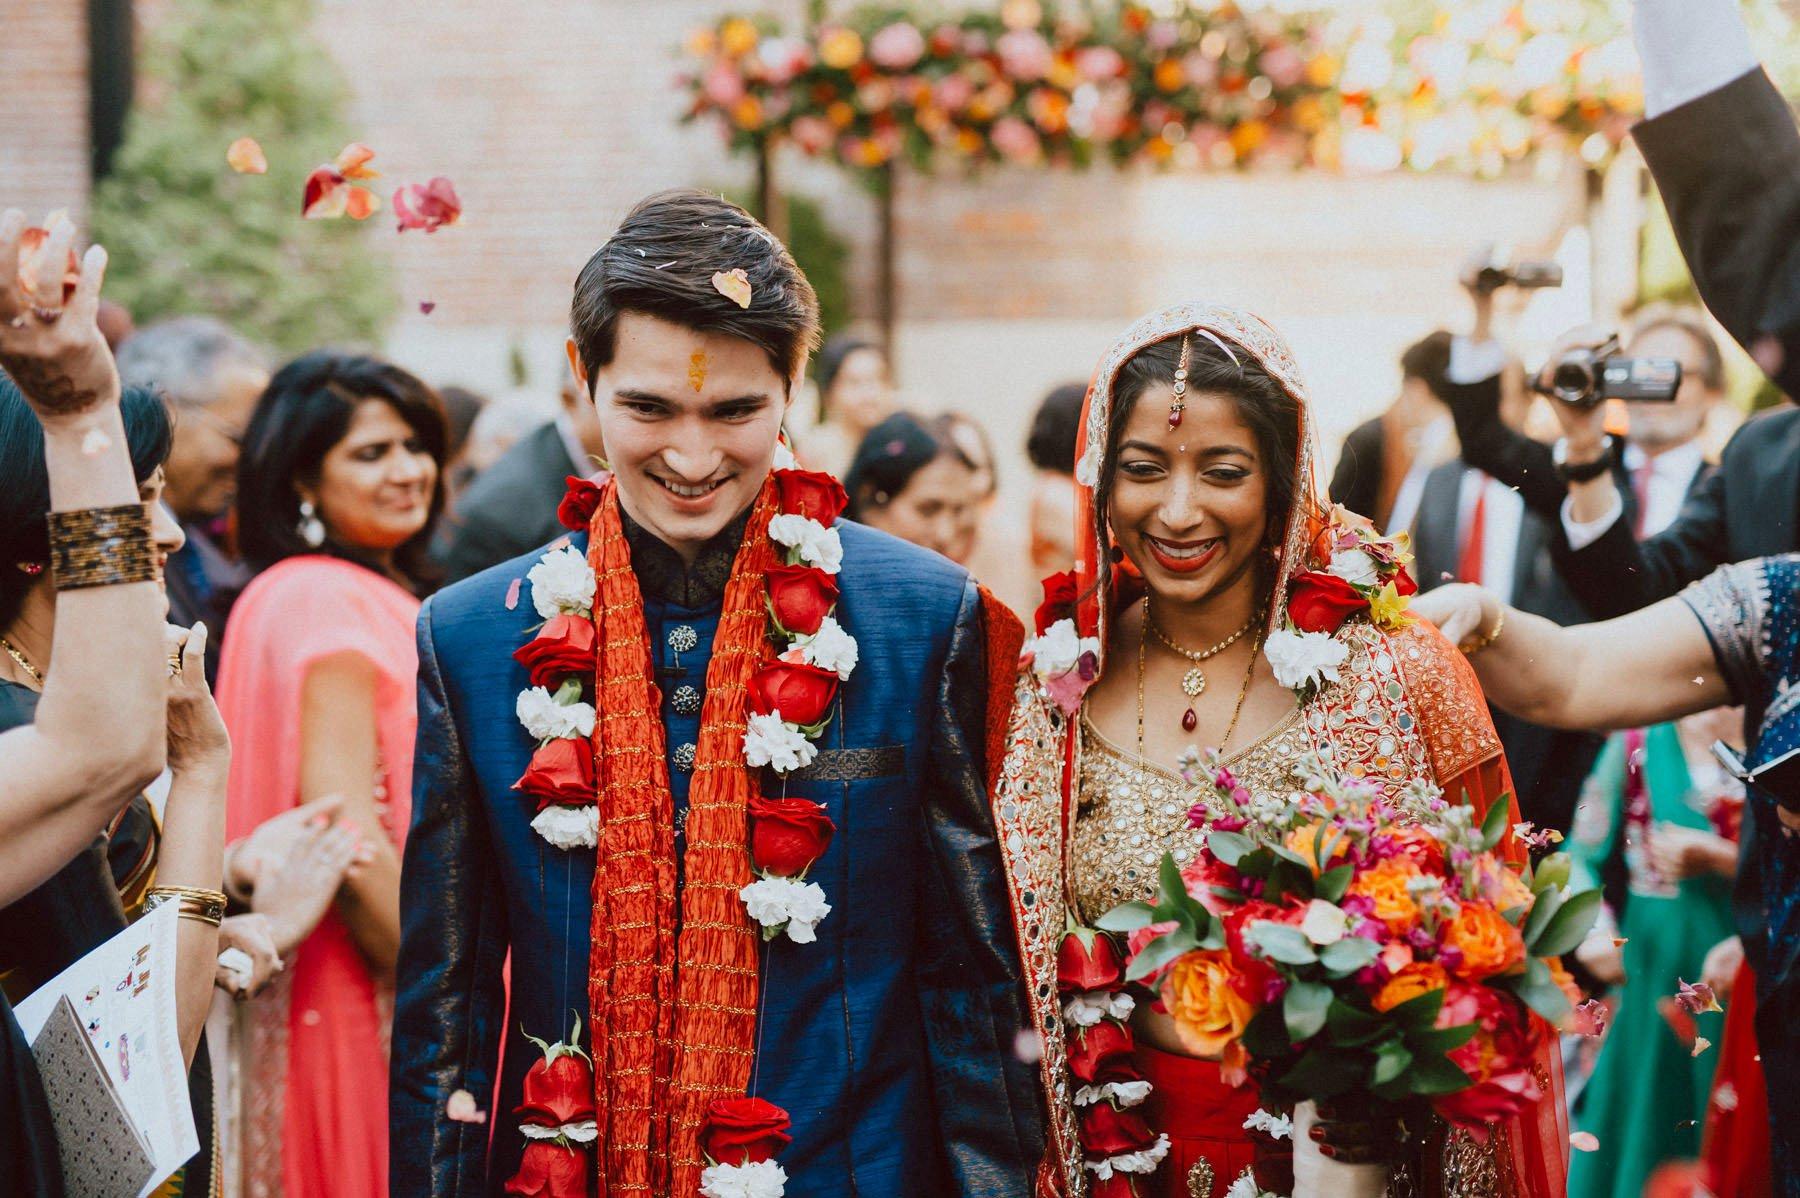 vie-philadelphia-indian-wedding-87.jpg